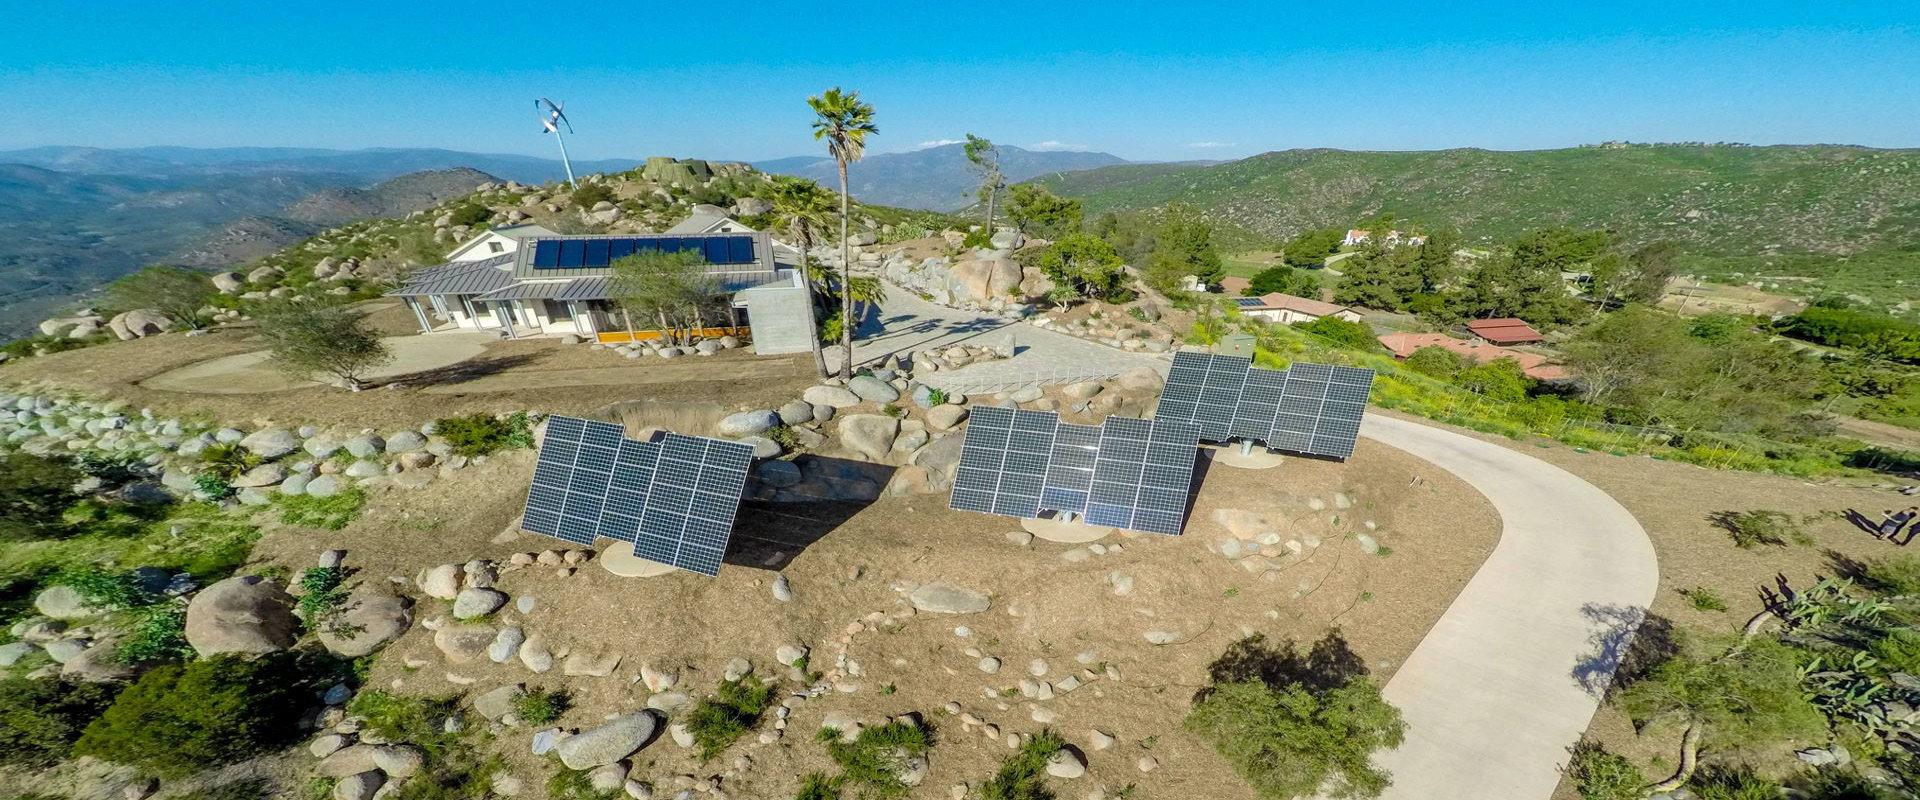 myCleantechSolarTracker™ Solaranalage - Hotel